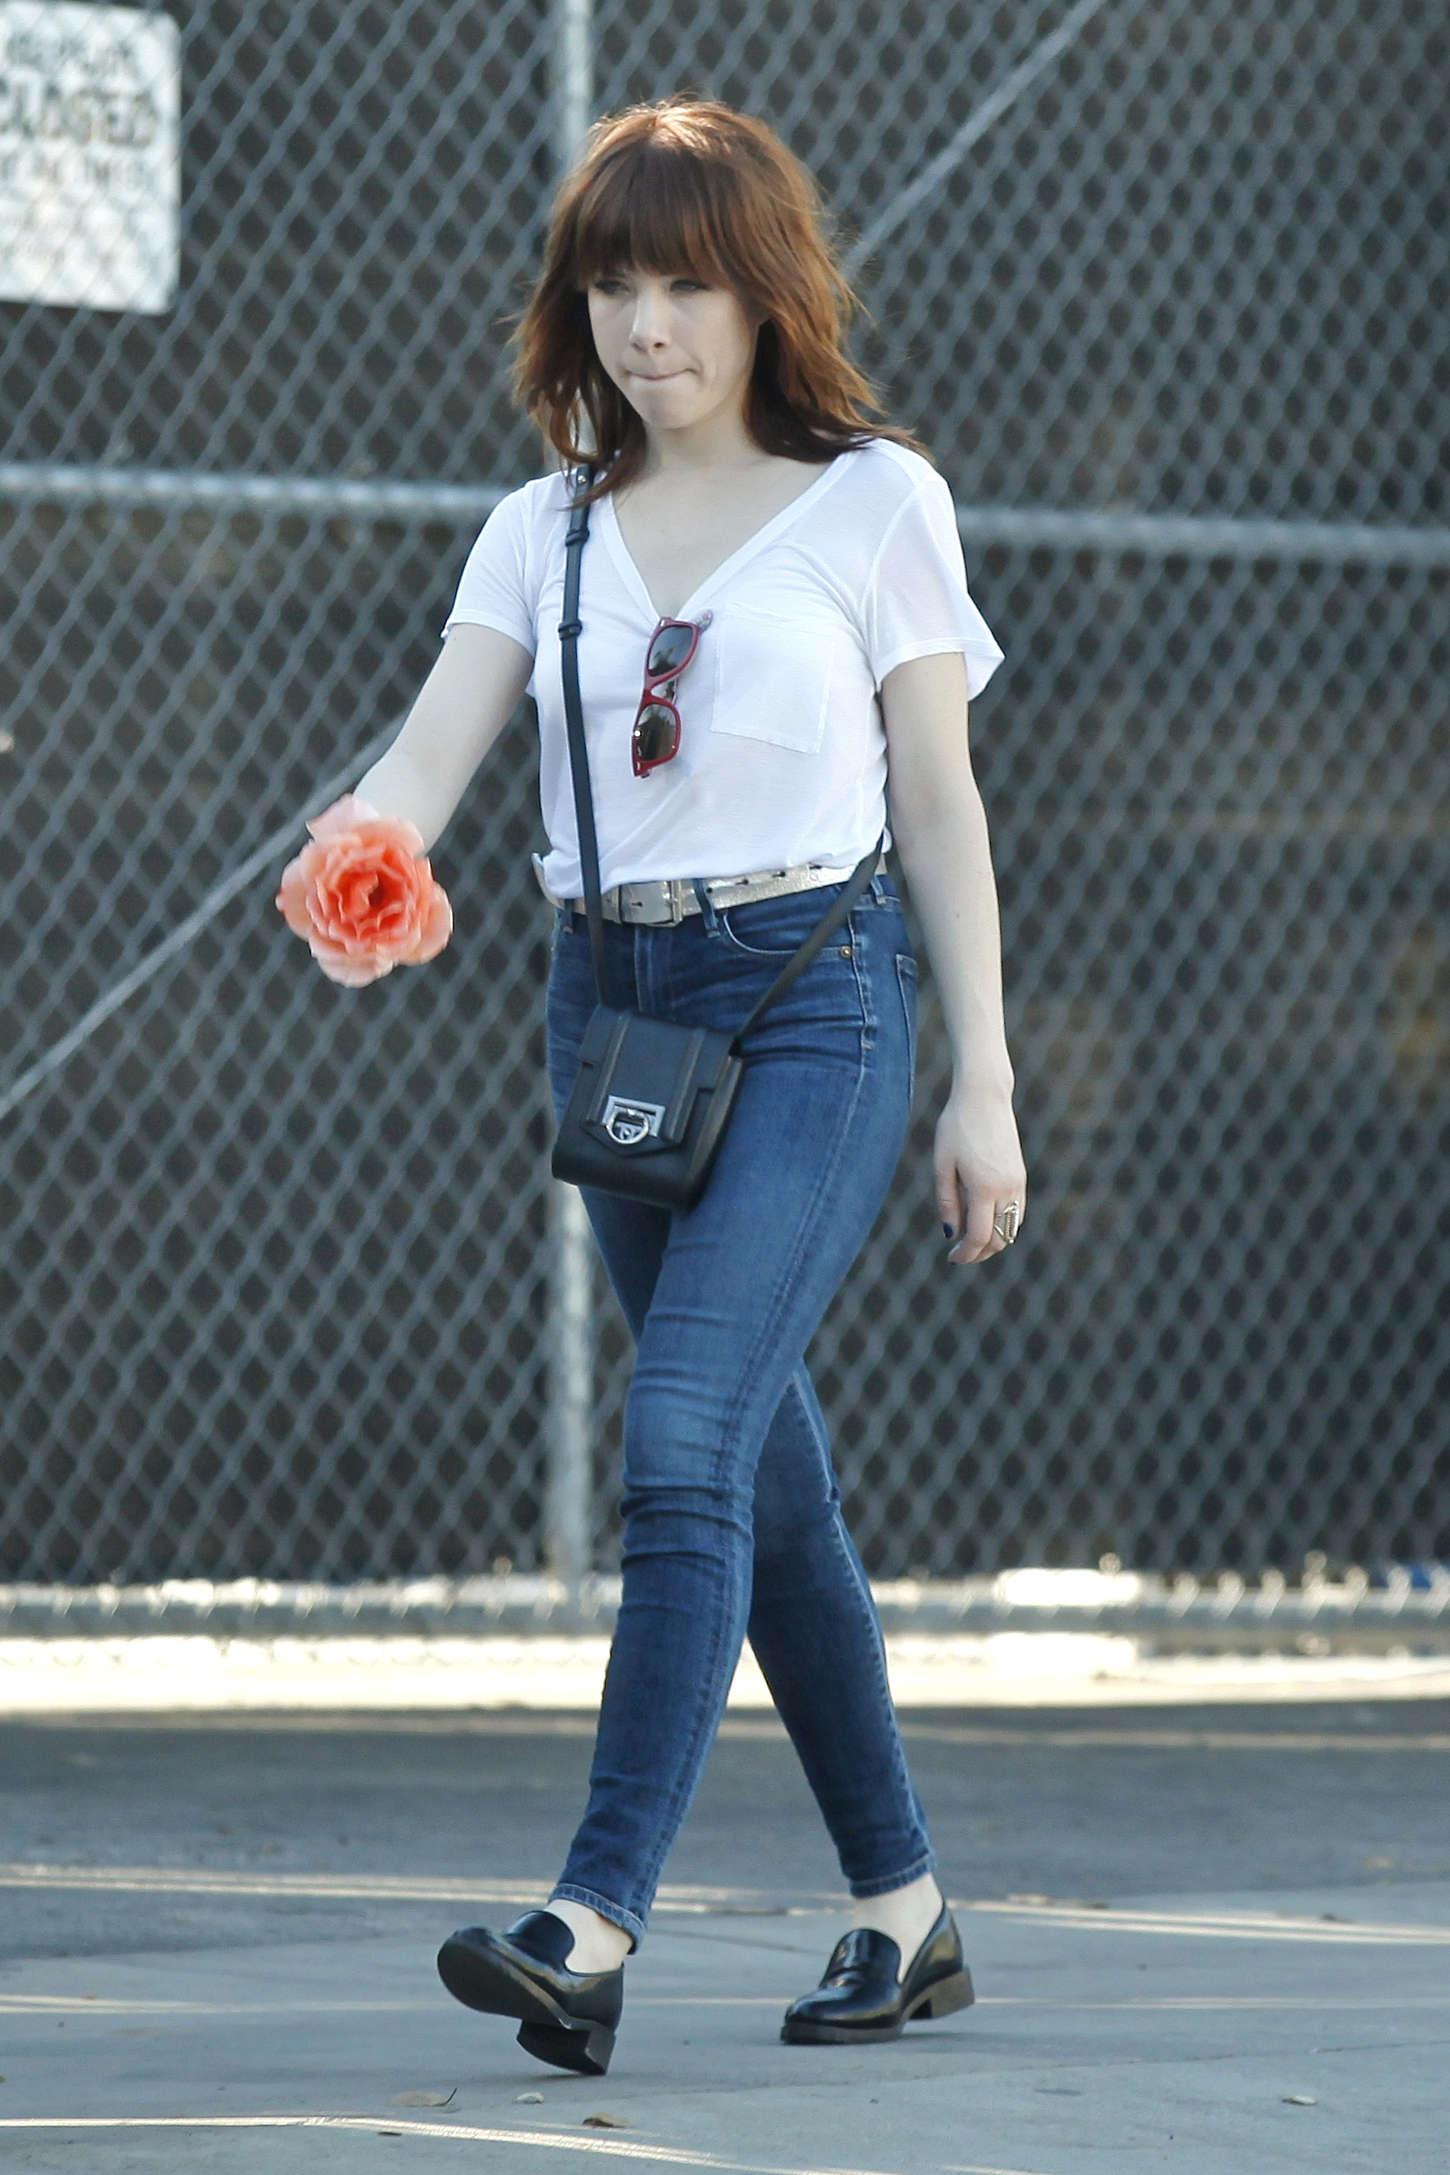 Carly Rae Jepsen 2015 : Carly Rae Jepsen in Tight jeans -05